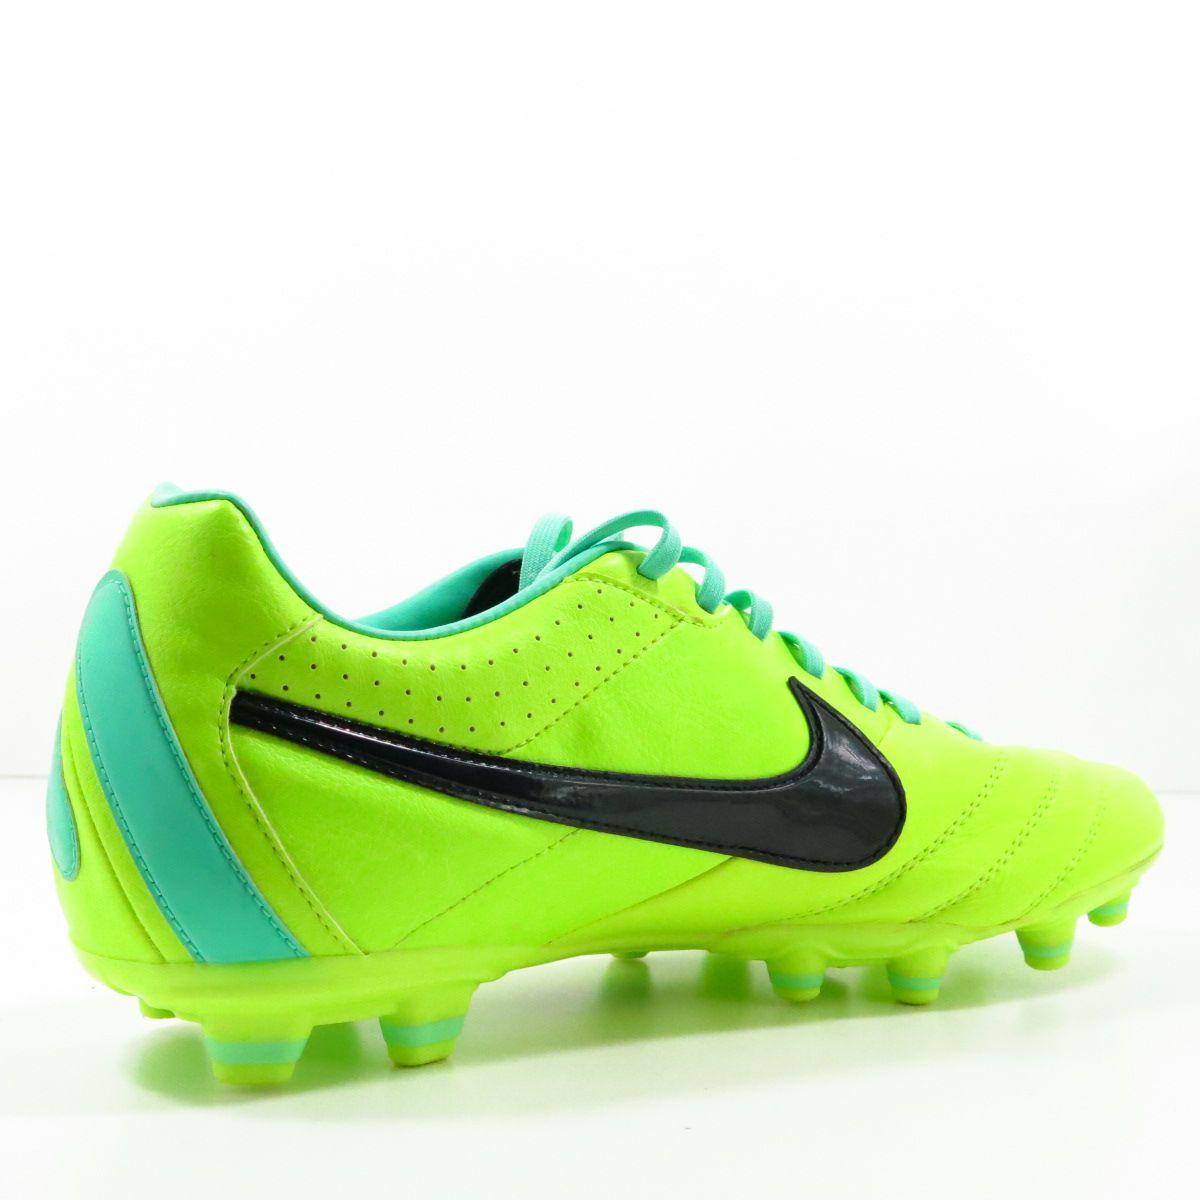 Chuteira Nike Tiempo Legacy FG - Couro